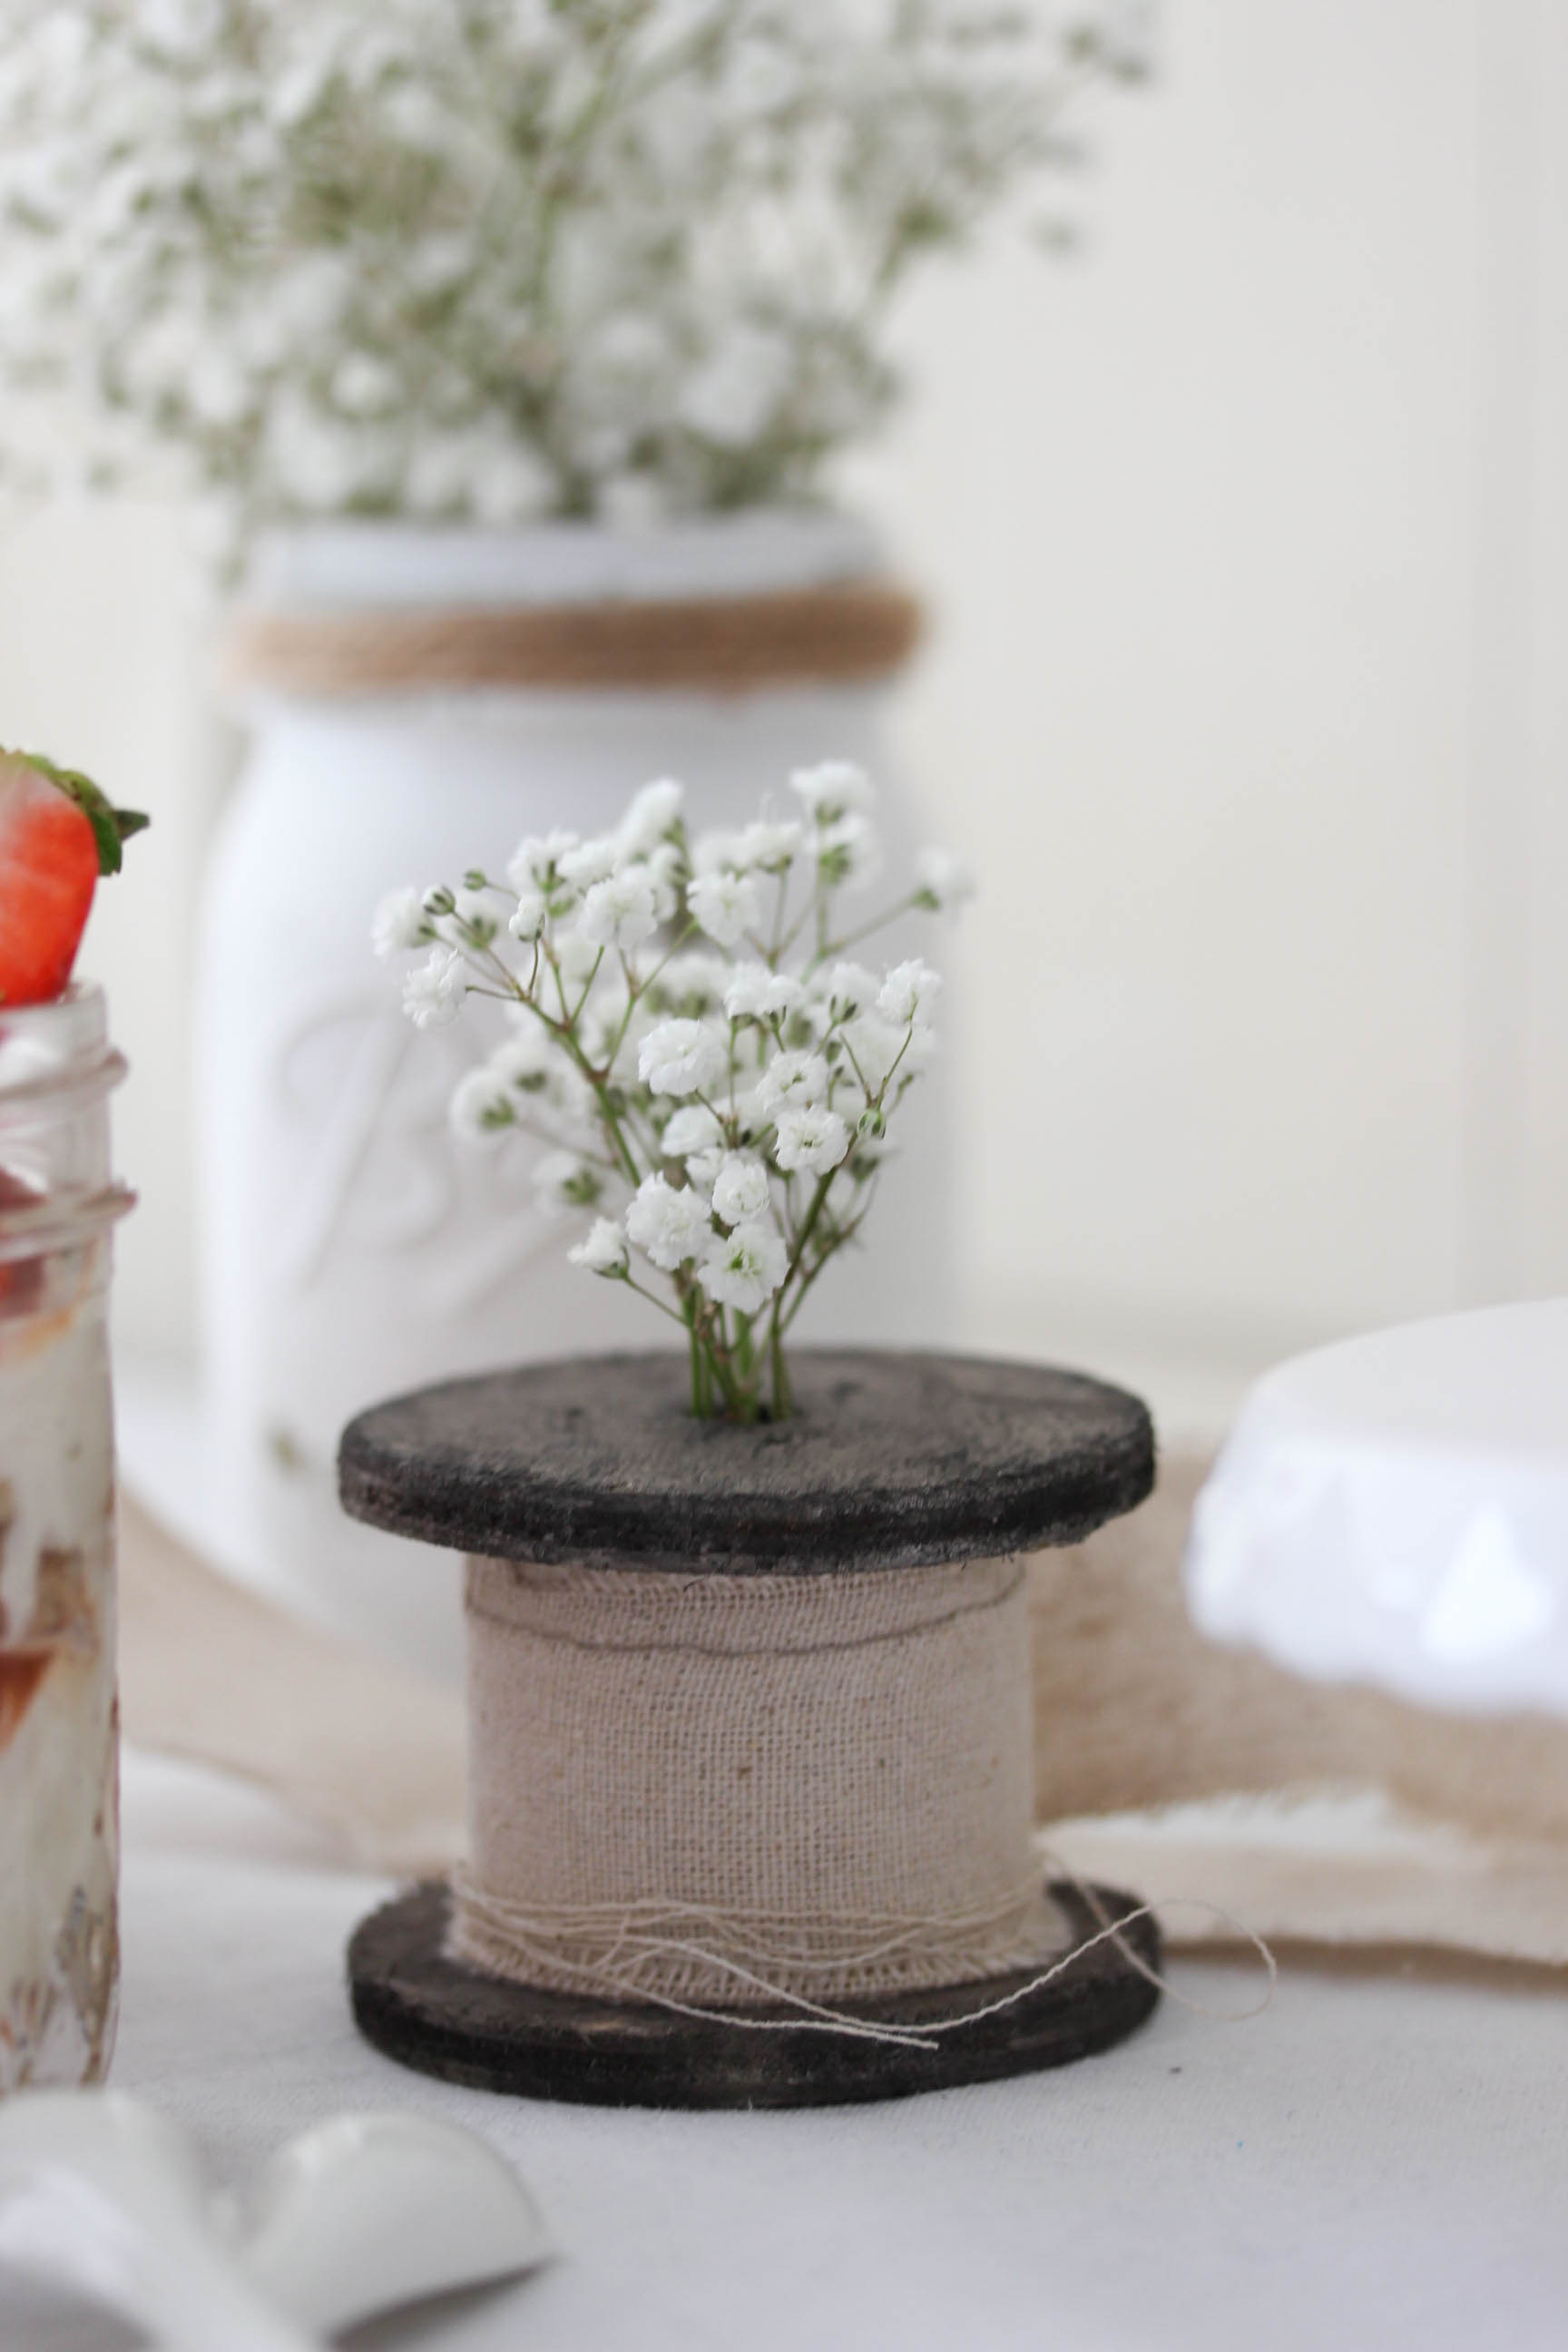 Einfaches Rhabarber Erdbeer Tiramisu Rezept Dessert im Glas Löffelbiskuits #tiramisu #dessert #rhabarber #rhubarb #erdbeeren #dessertinajar | Emma´s Lieblingsstücke